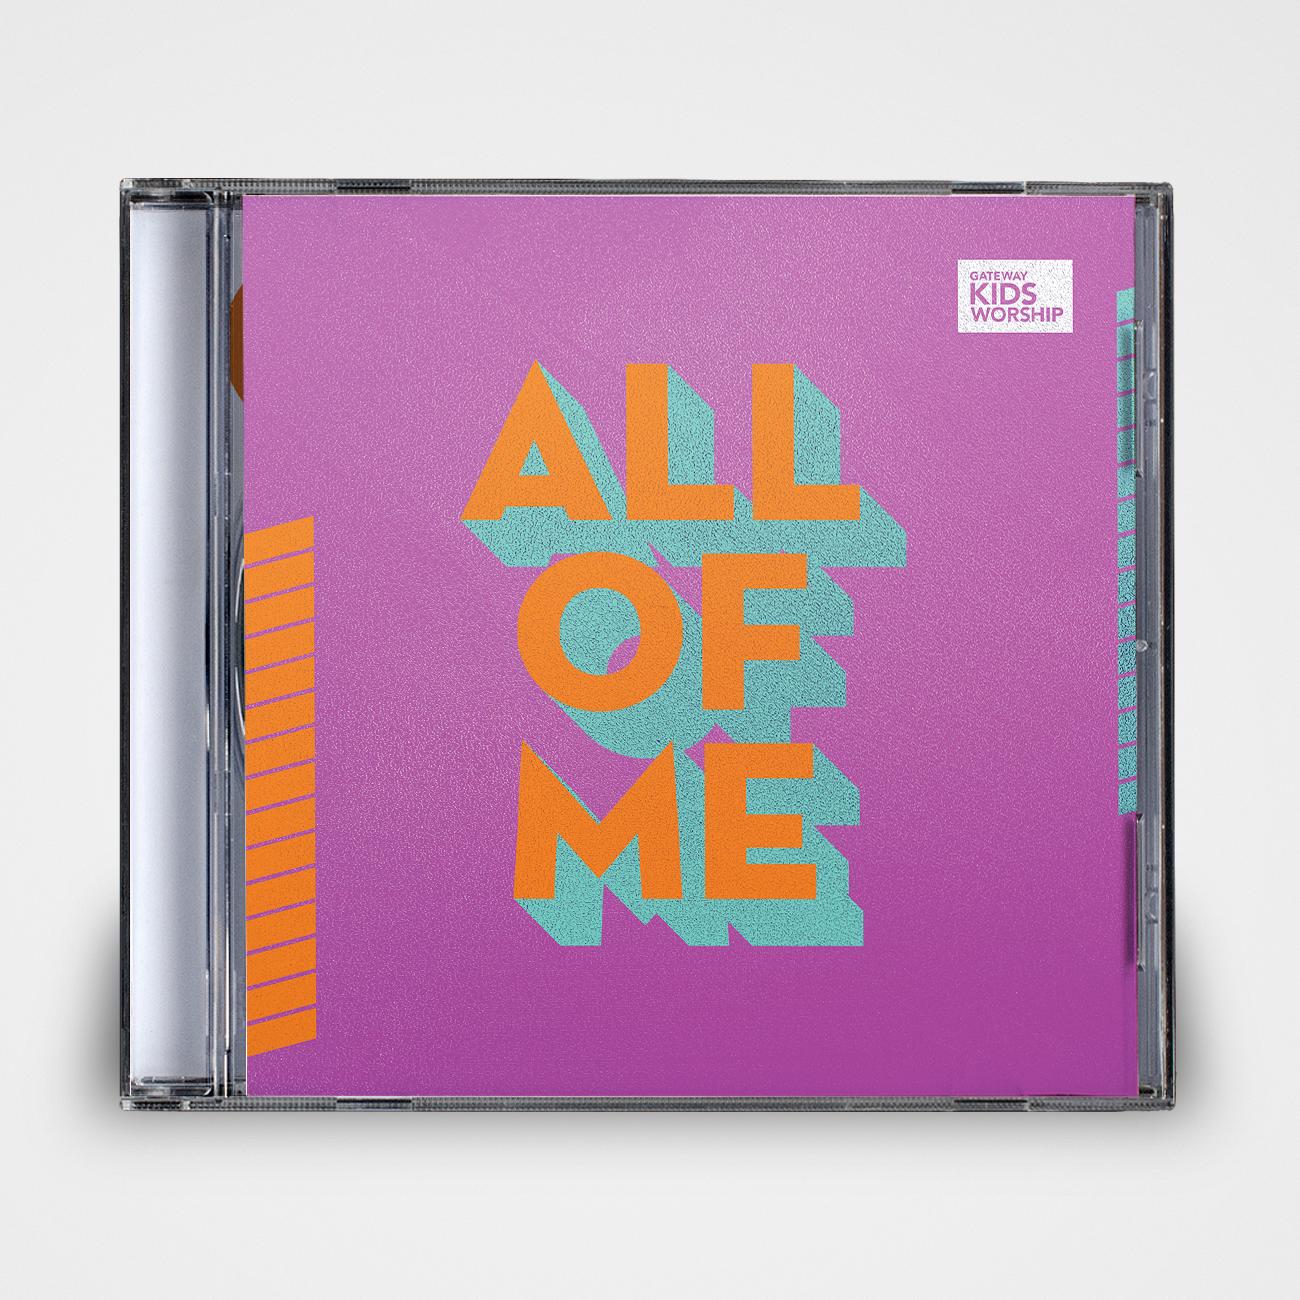 Gateway Kids - All of Me CD